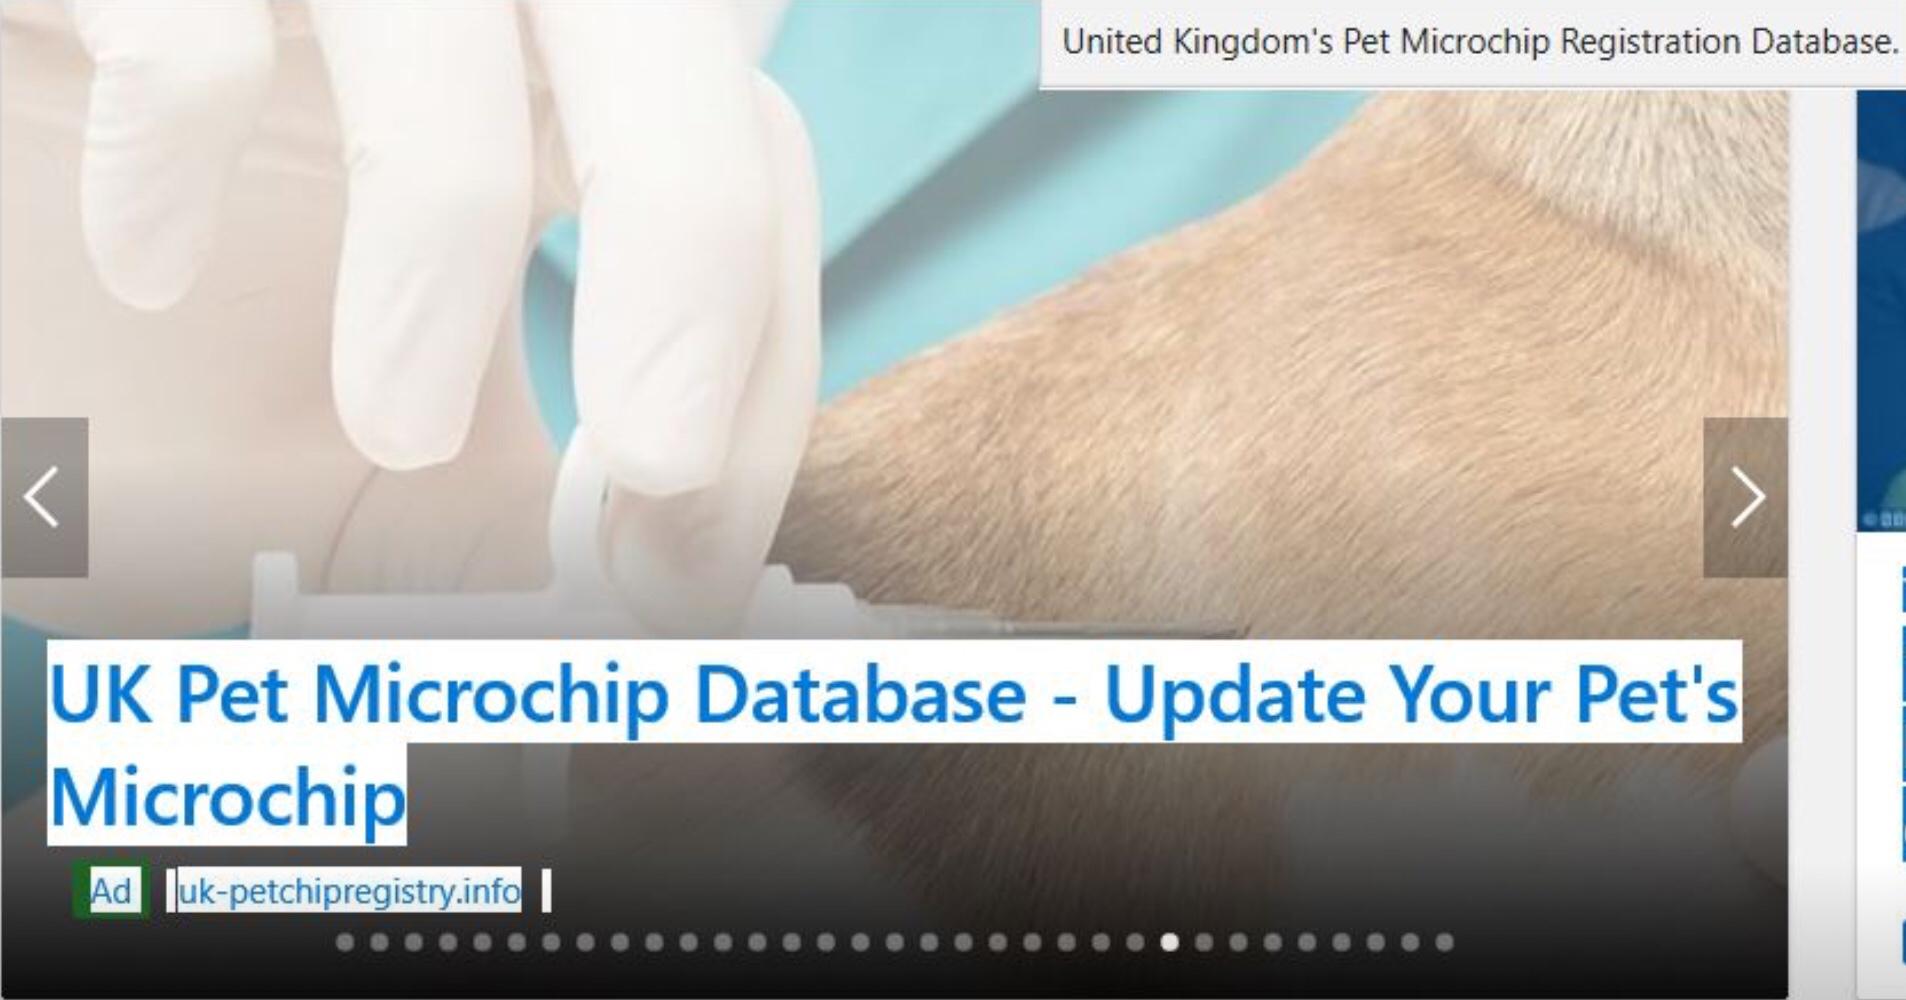 #FernsLaw point 8:- Statement on bogus UK pet microchip database